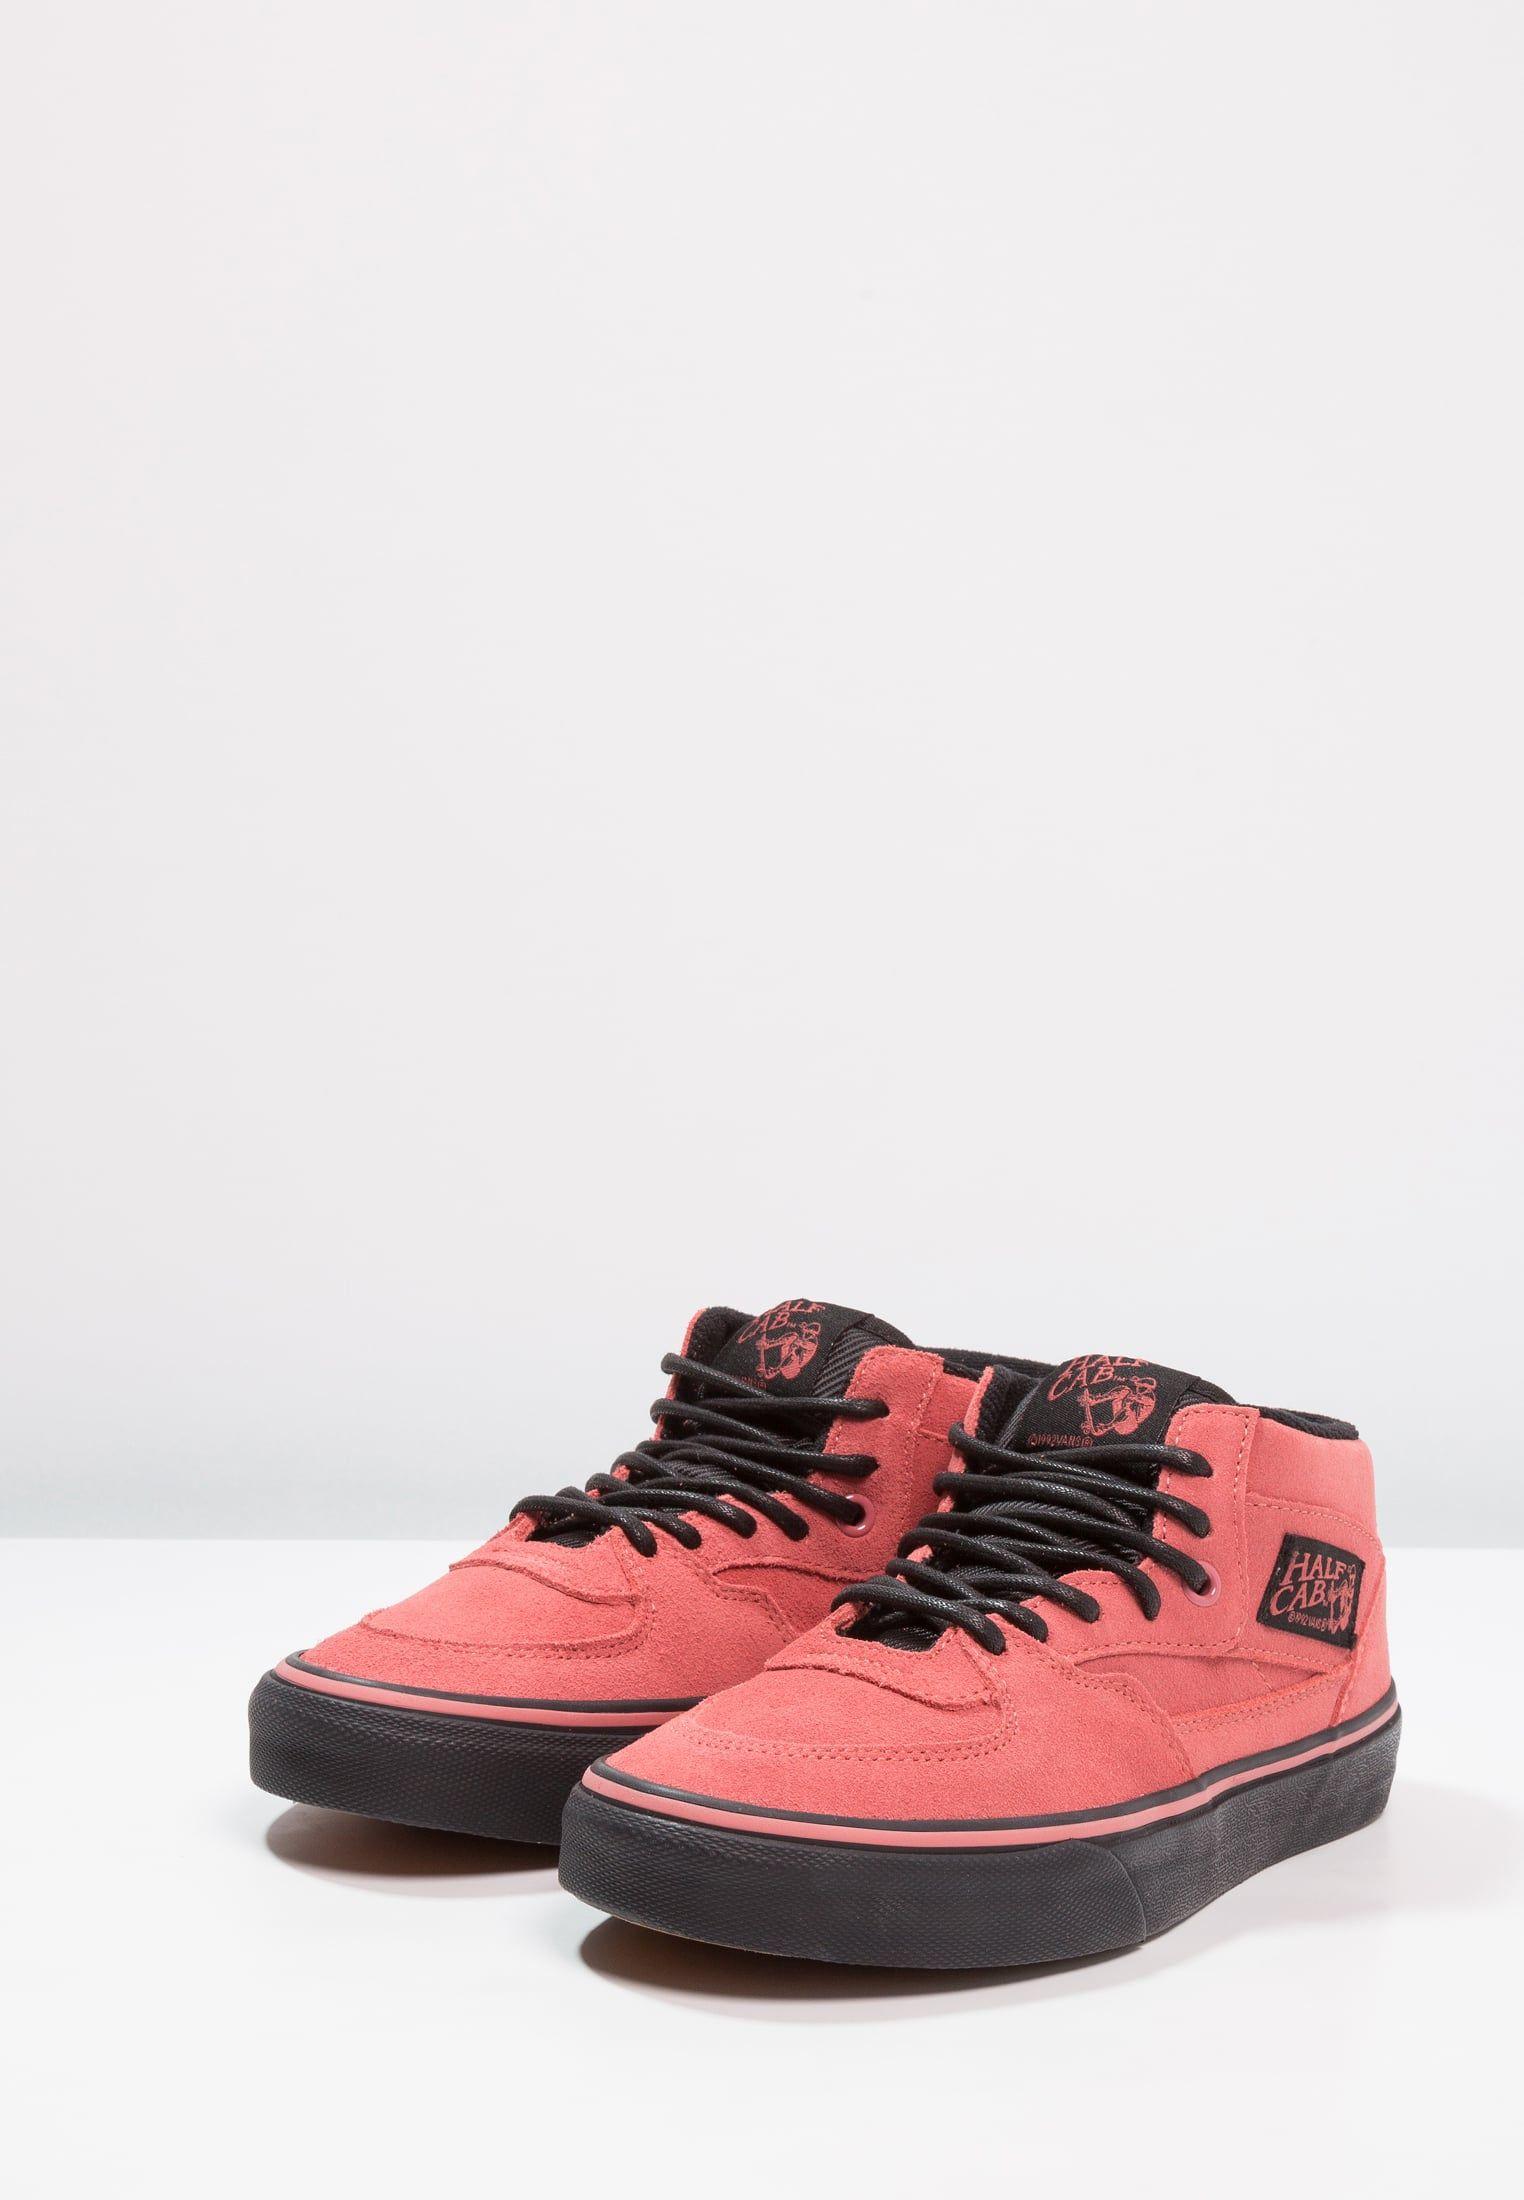 Vans UA HALF CAB Sneaker high faded roseblack für 33,95